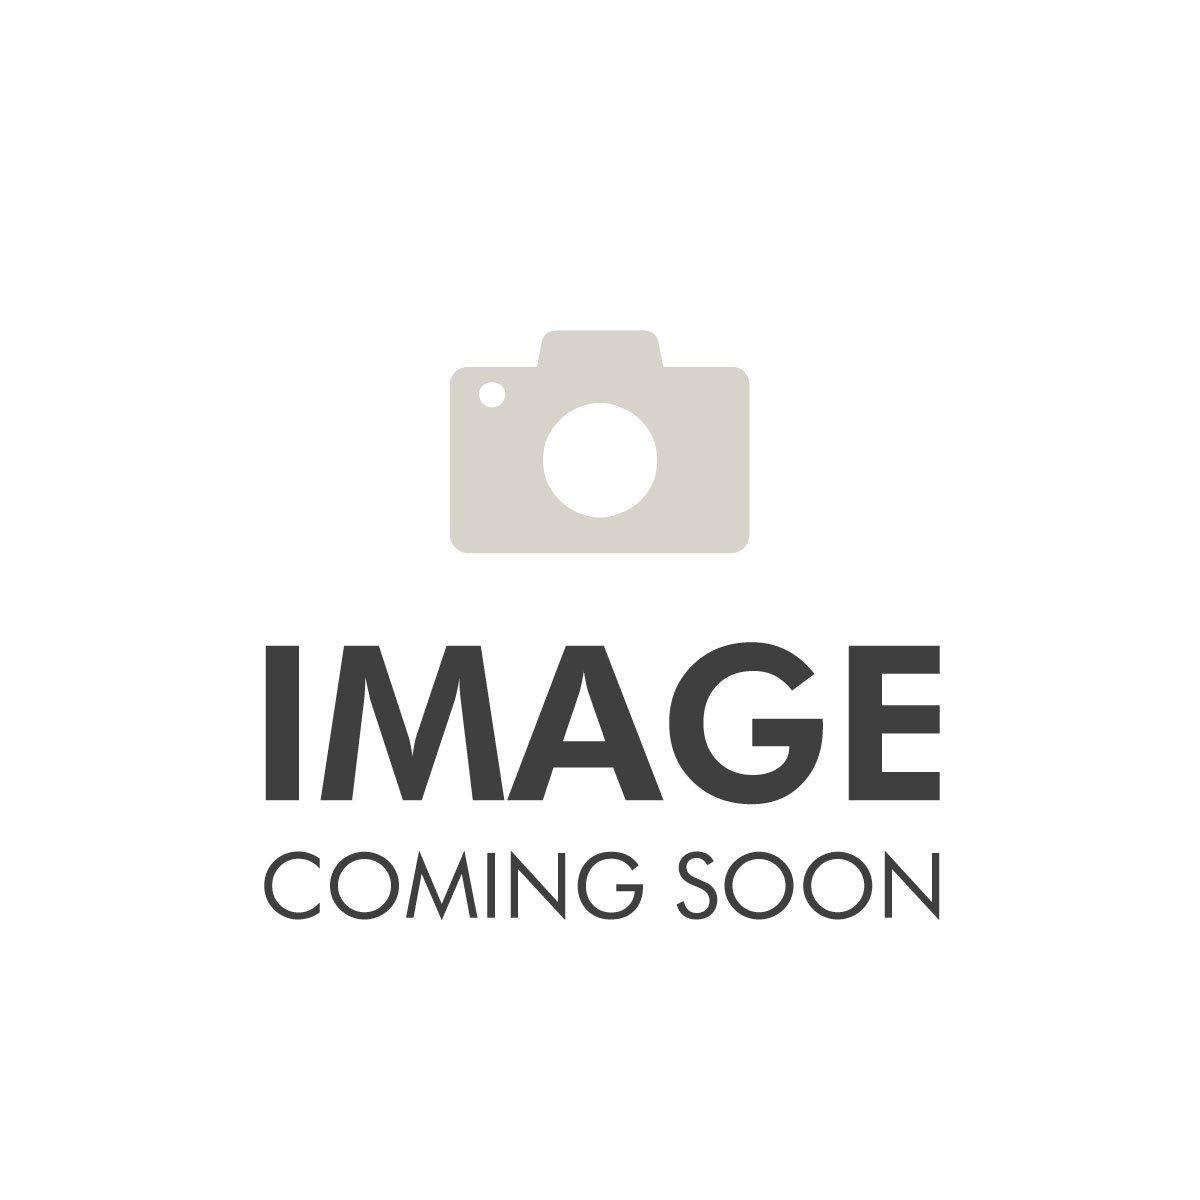 Allstar - Bavette de remplacement - Vario - Ultra-léger